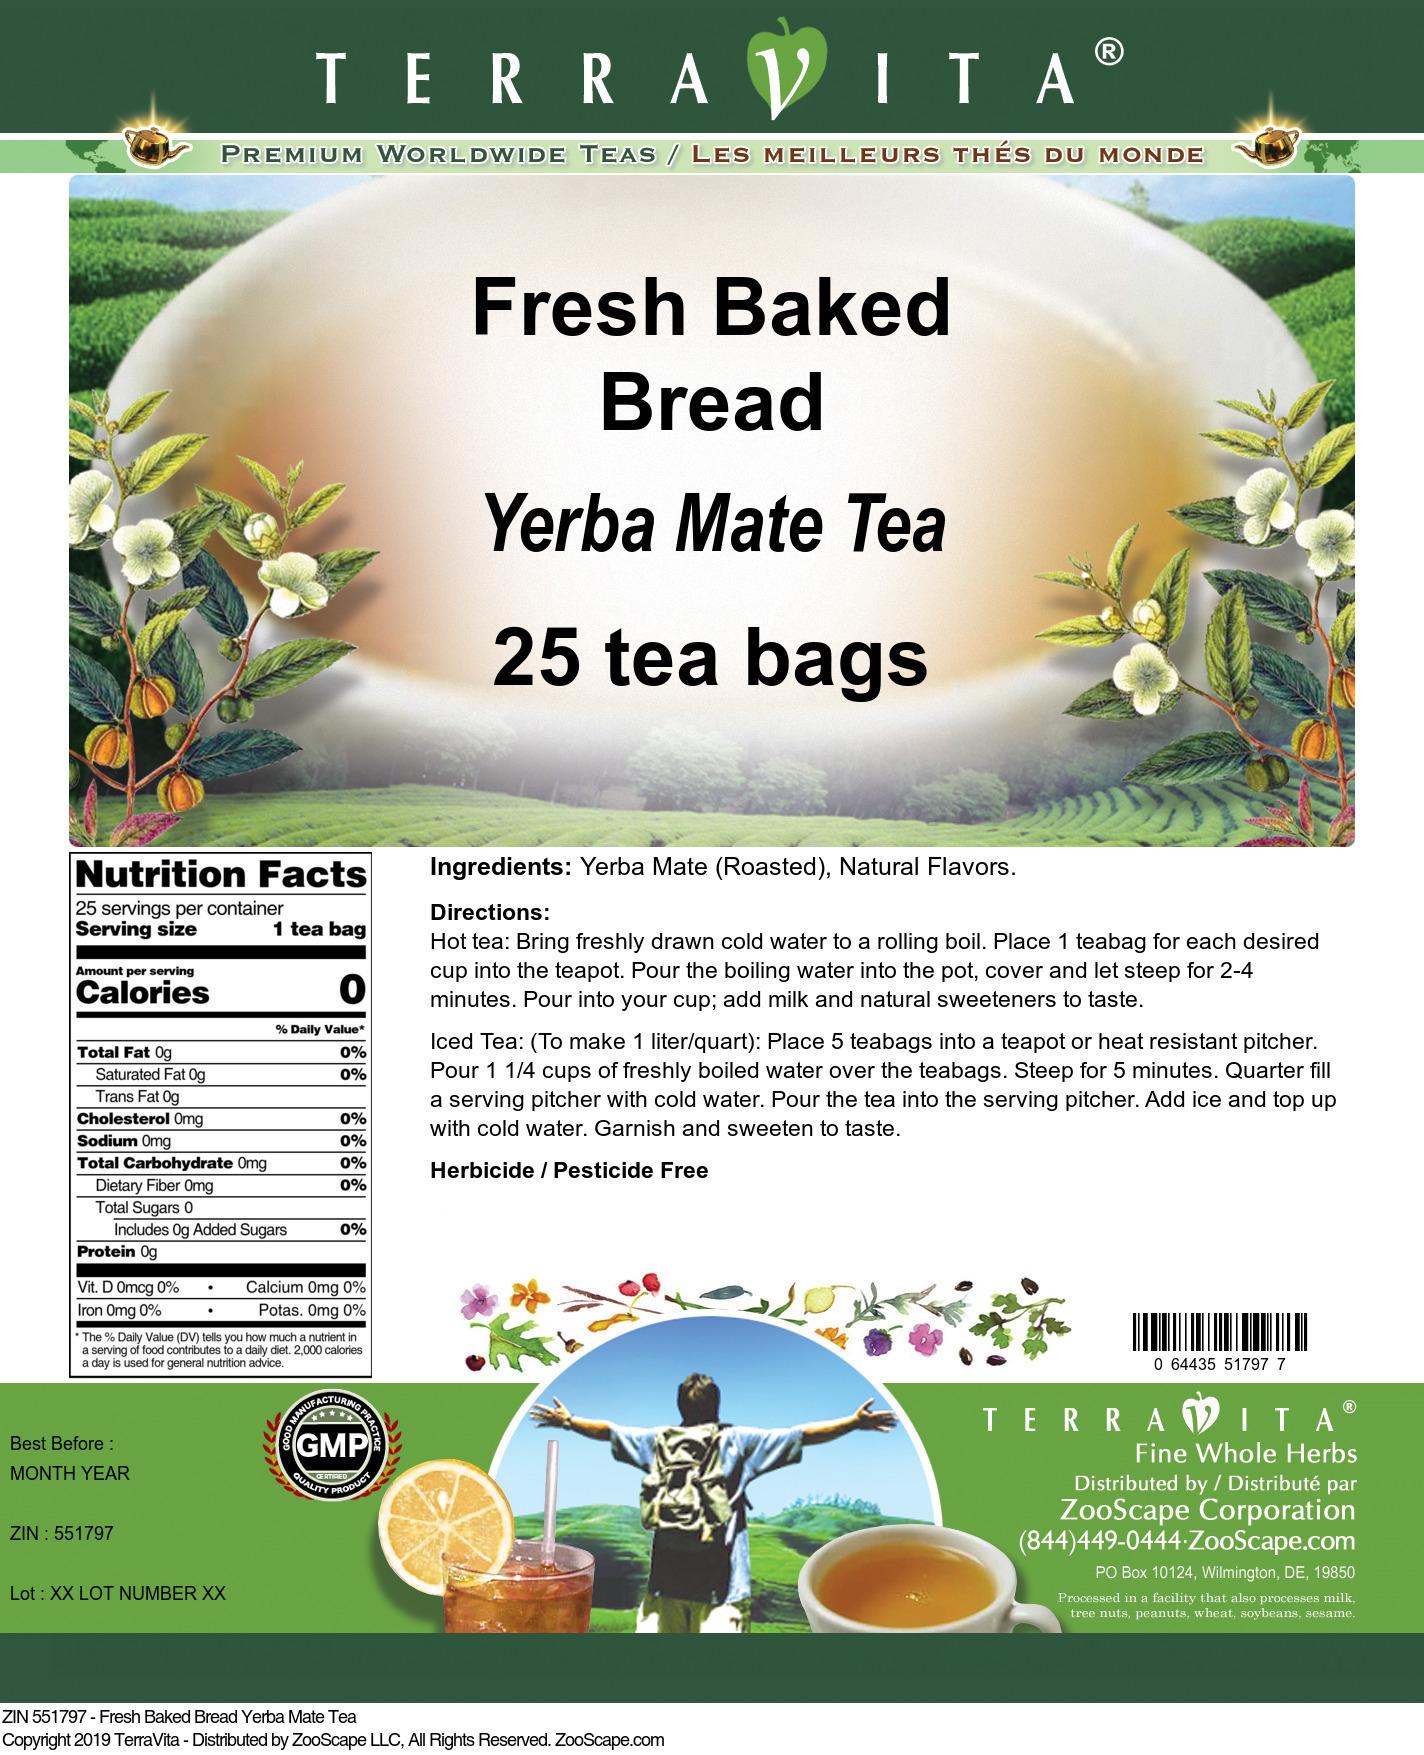 Fresh Baked Bread Yerba Mate